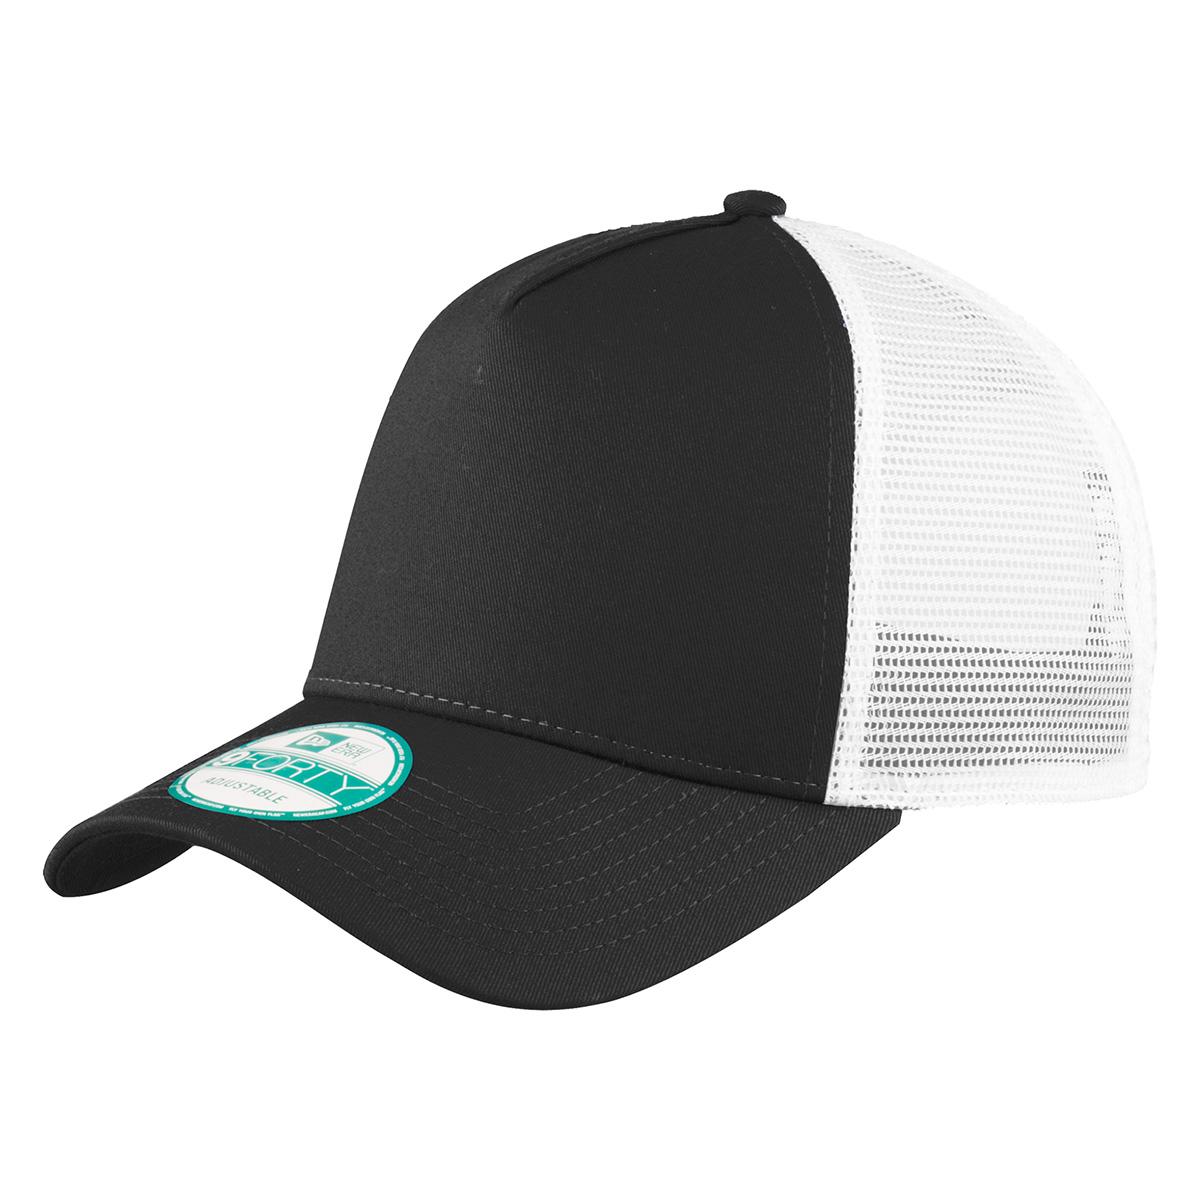 47e50fd03 NE205 New Era® Snapback Trucker Cap - Hit Promotional Products